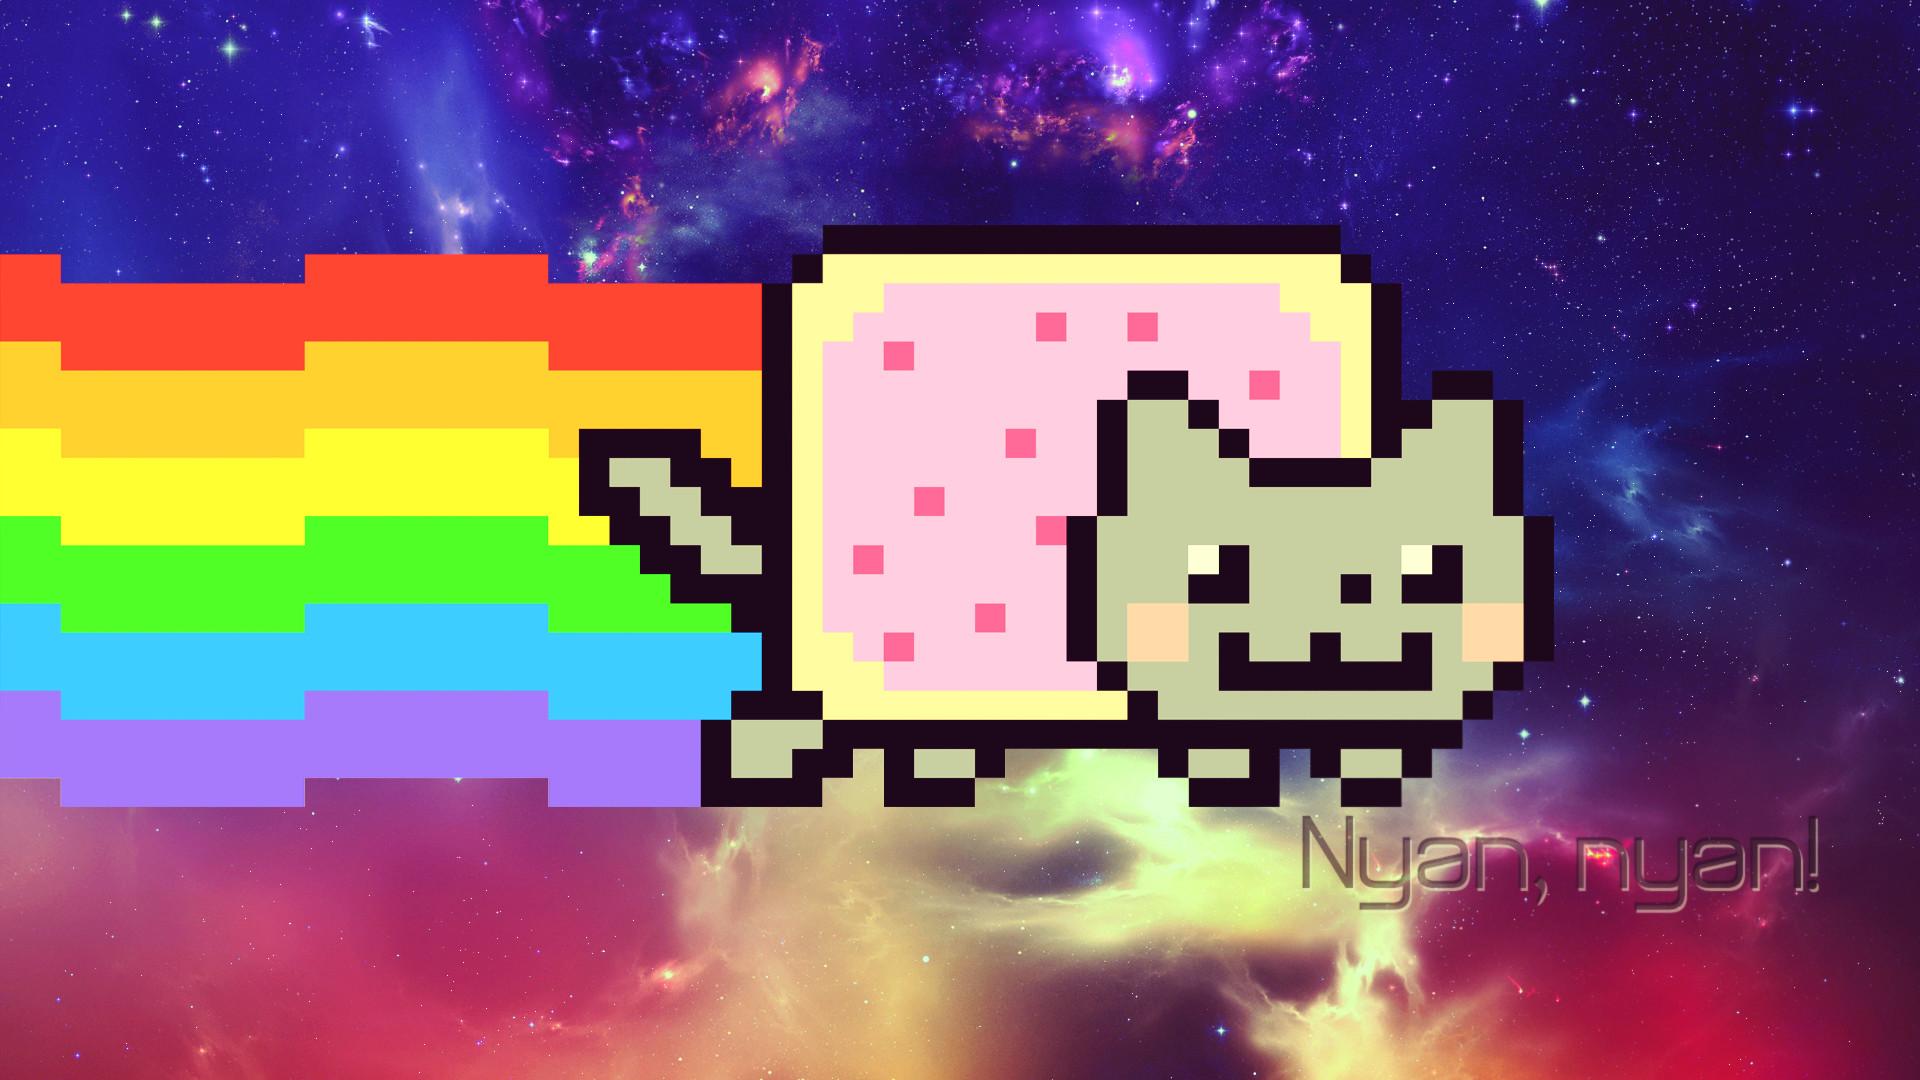 Nyan Cat Wallpapers 74 Images